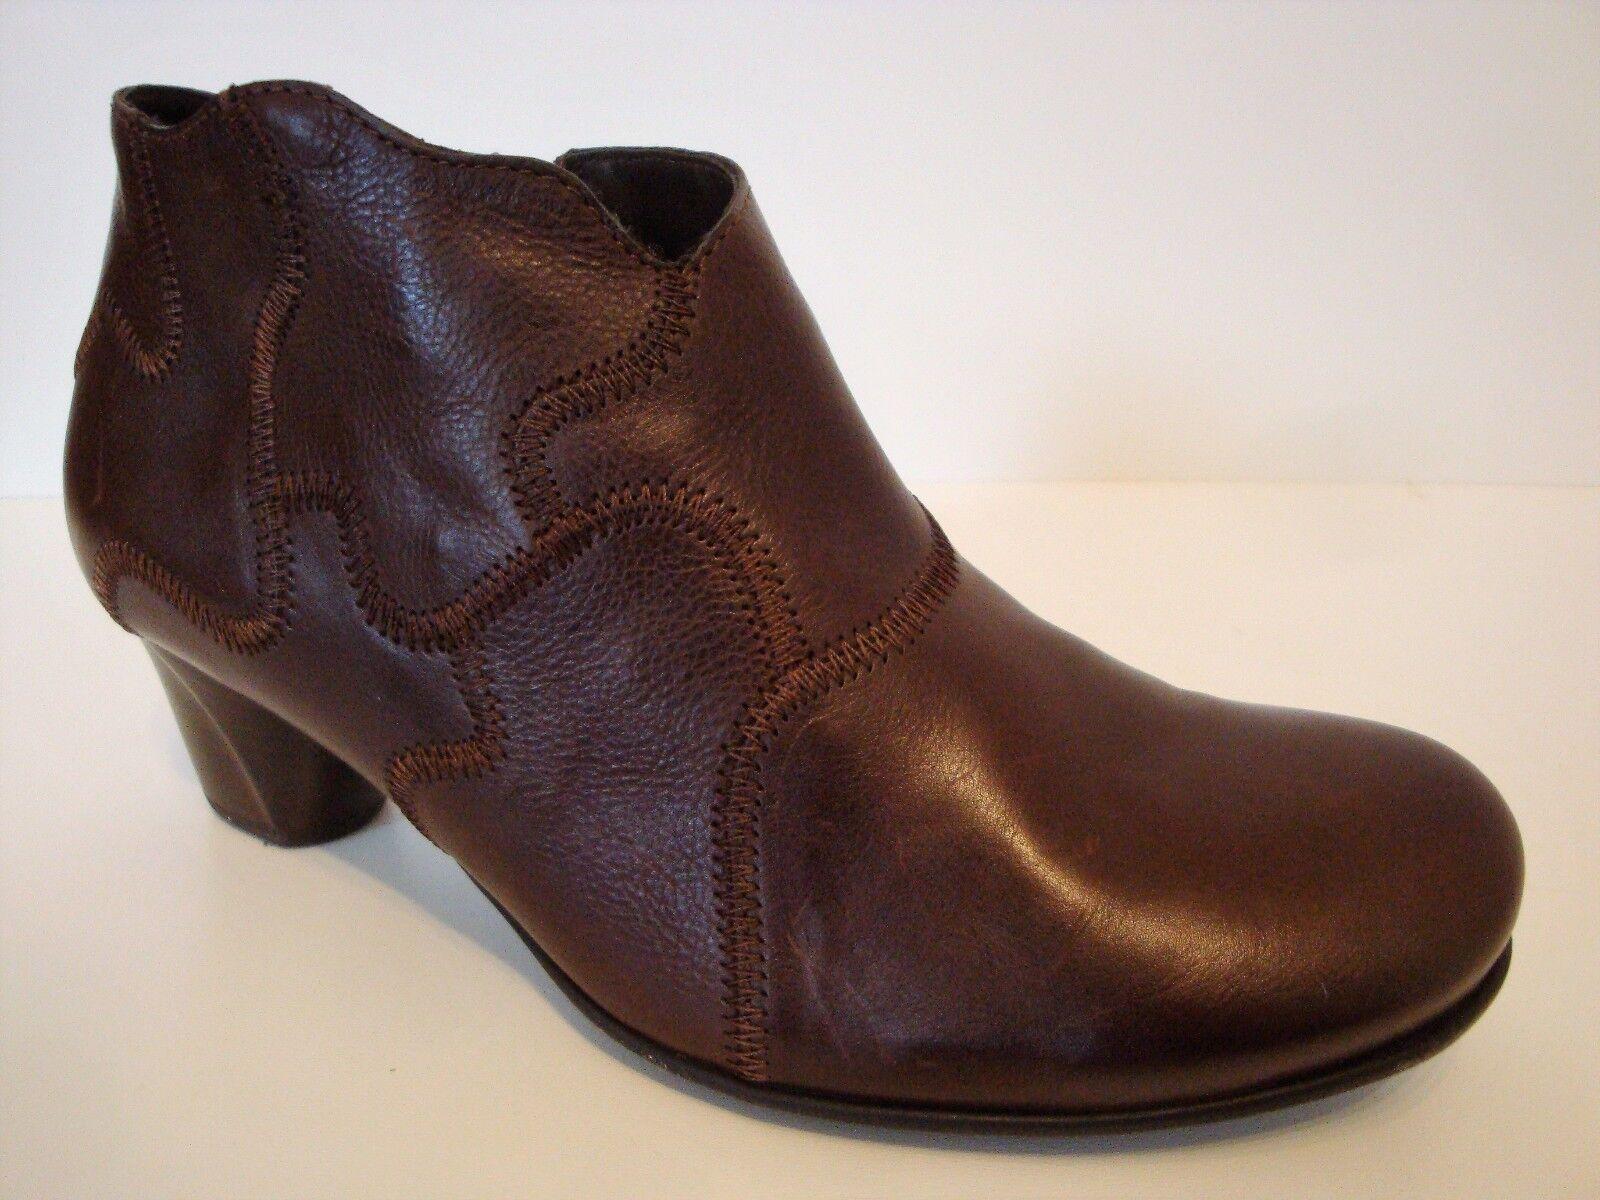 THINK Shoes Damen Schuhe Stiefel Stiefeleten Shoes THINK for women